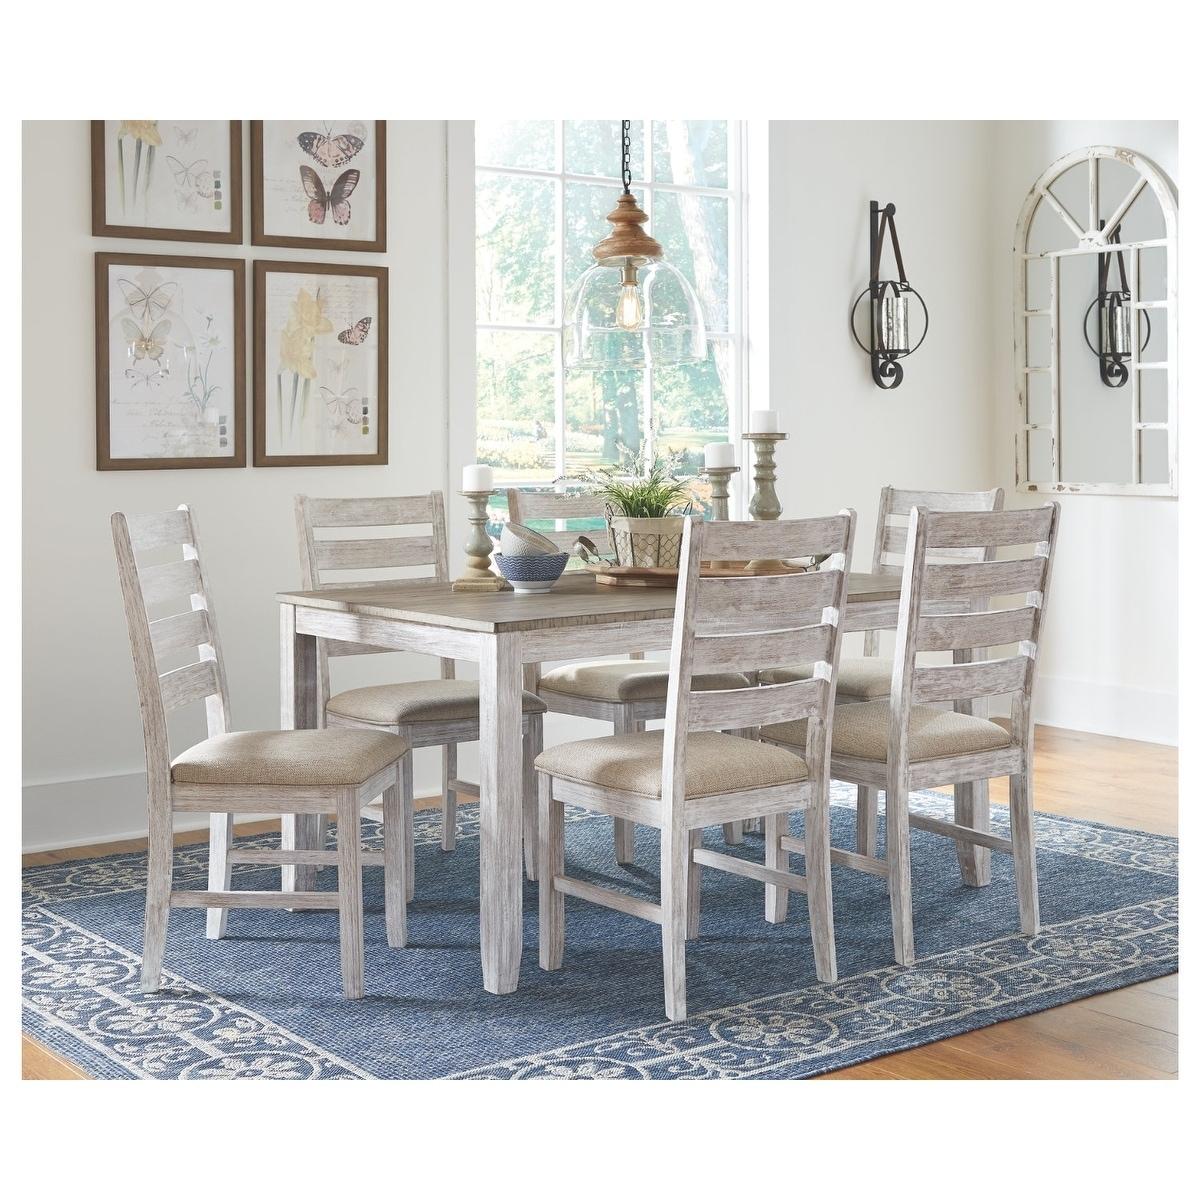 The Gray Barn Dunbeg Bay 7-piece Dining Room Table Set